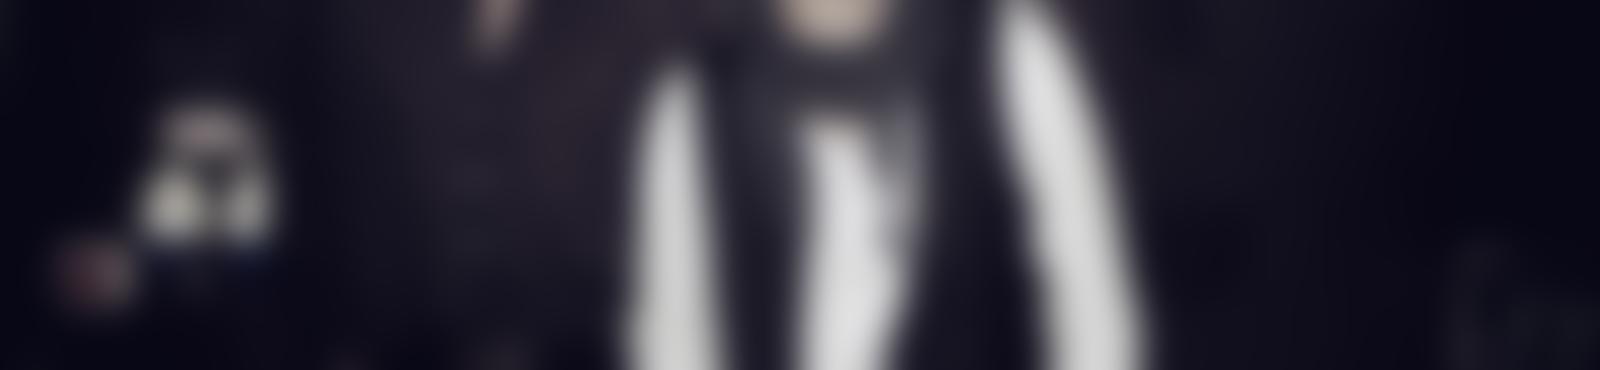 Blurred e962d2d4 95ff 4058 9857 c5f1a1c53d6b